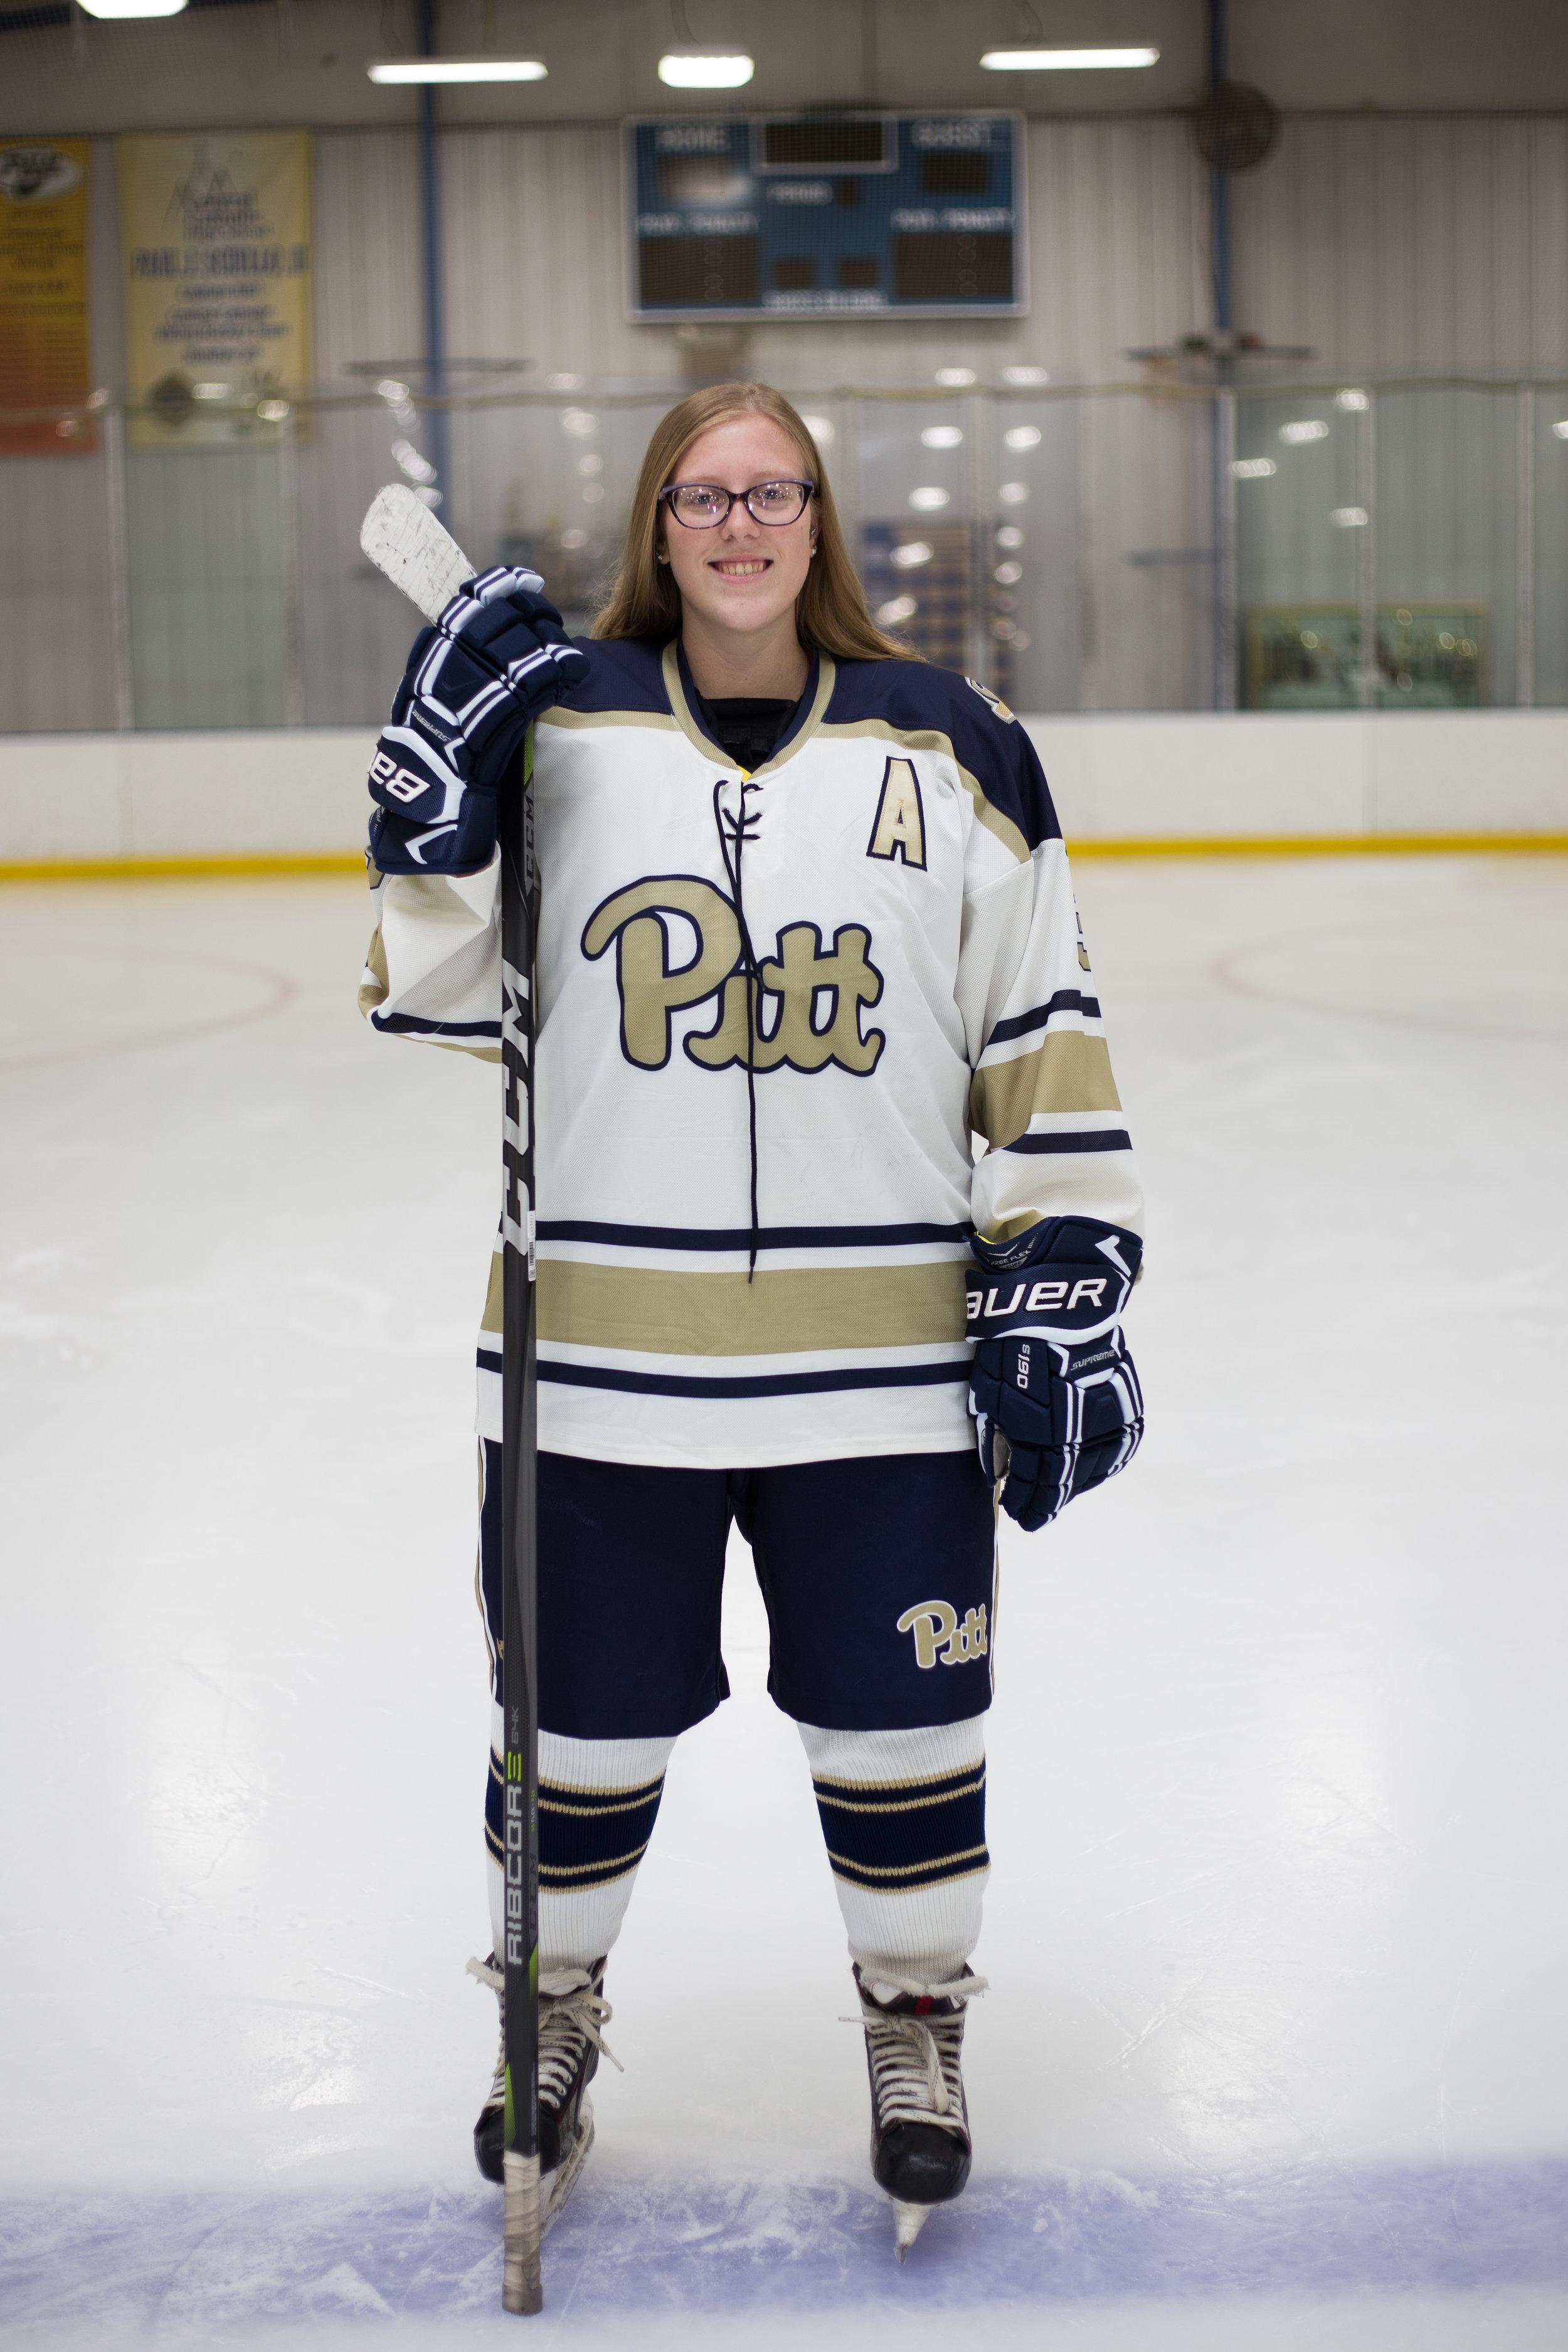 hockeyPortraits-22.JPG